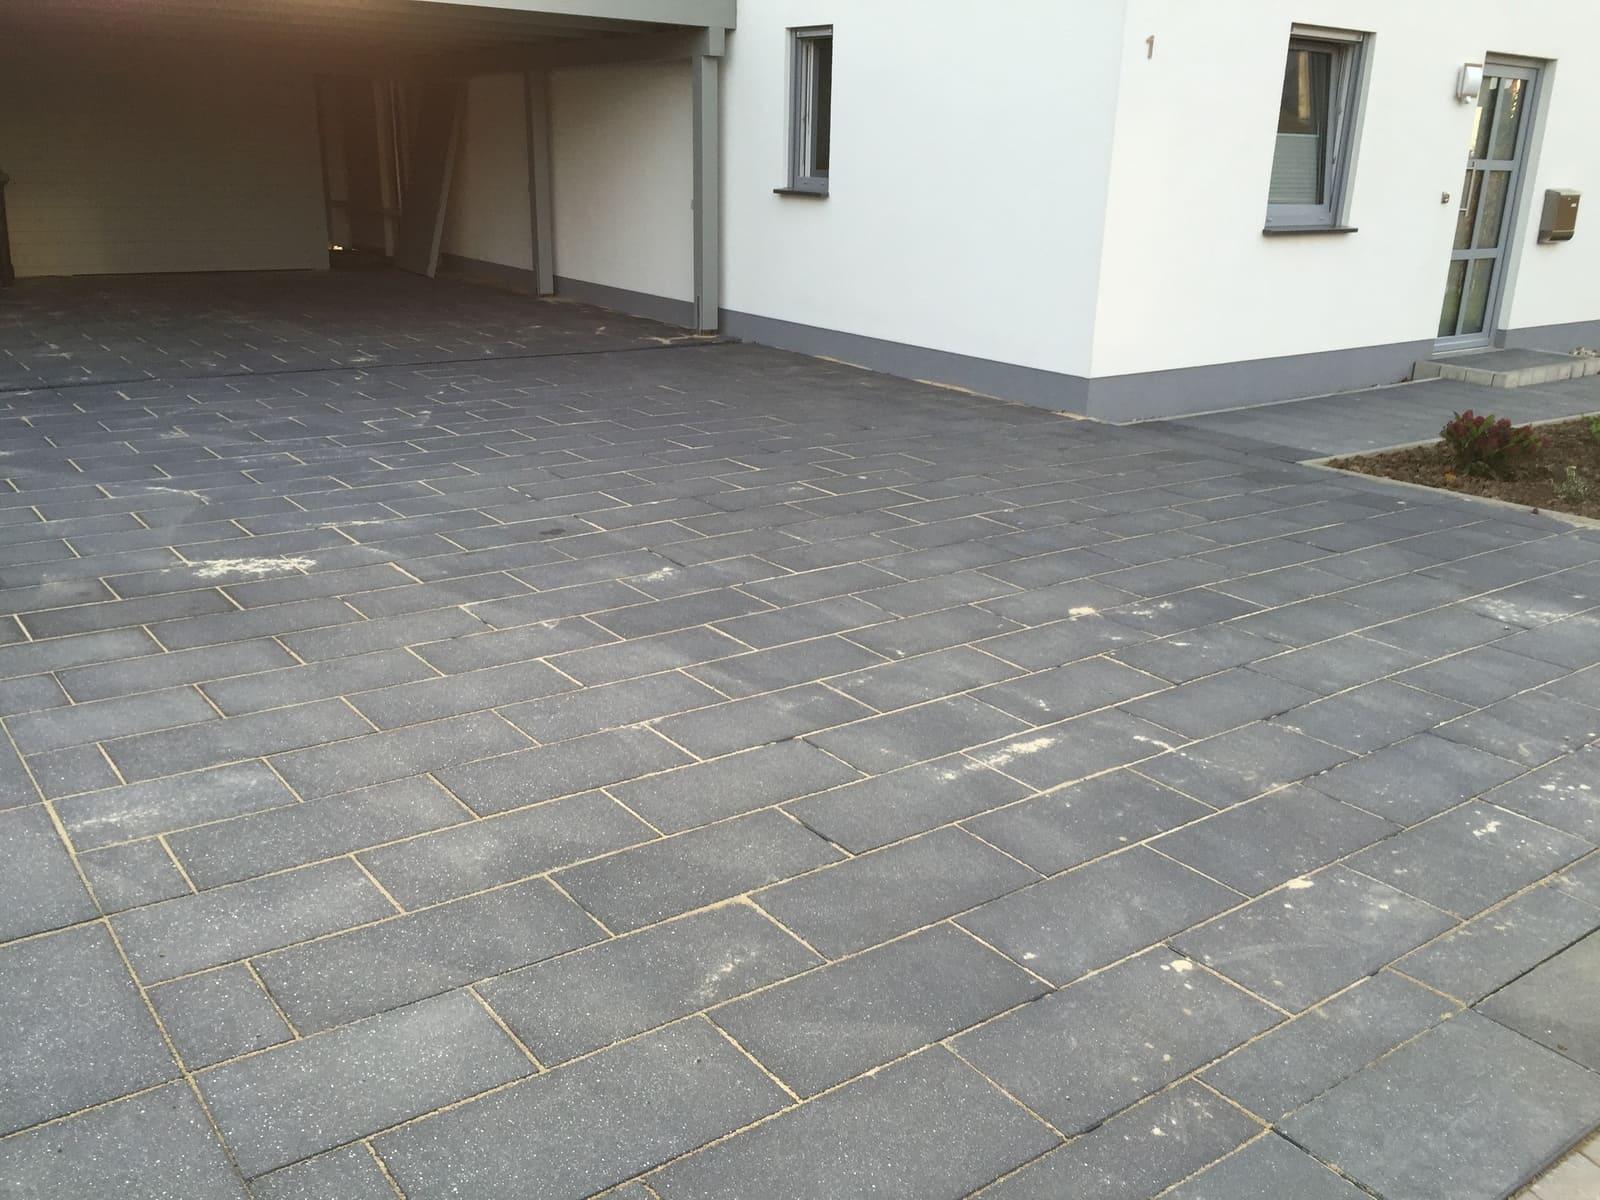 Detmold lippe private hofeinfahrt landschaftsbau for Gartengestaltung hofeinfahrt